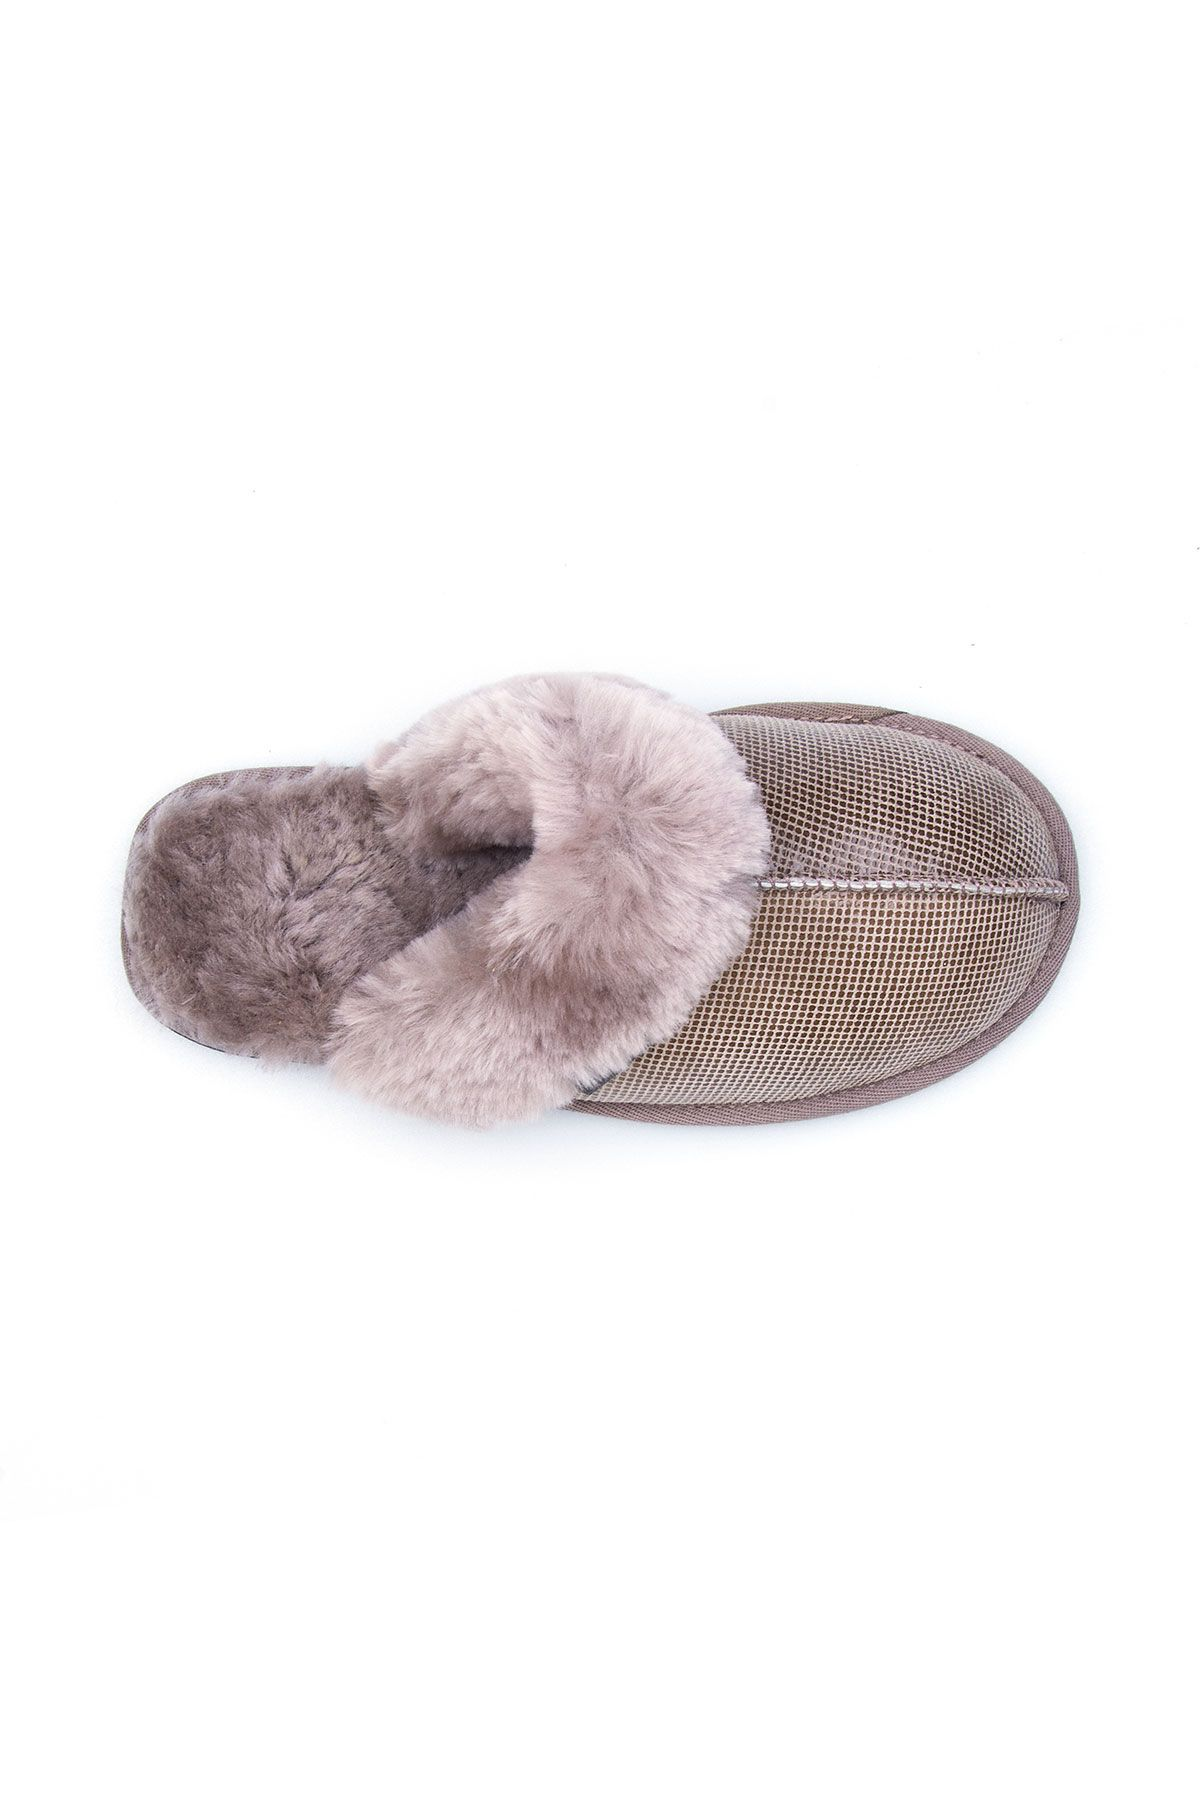 Pegia Genuine Sheepskin Women's House Slippers 191104 Sand-colored